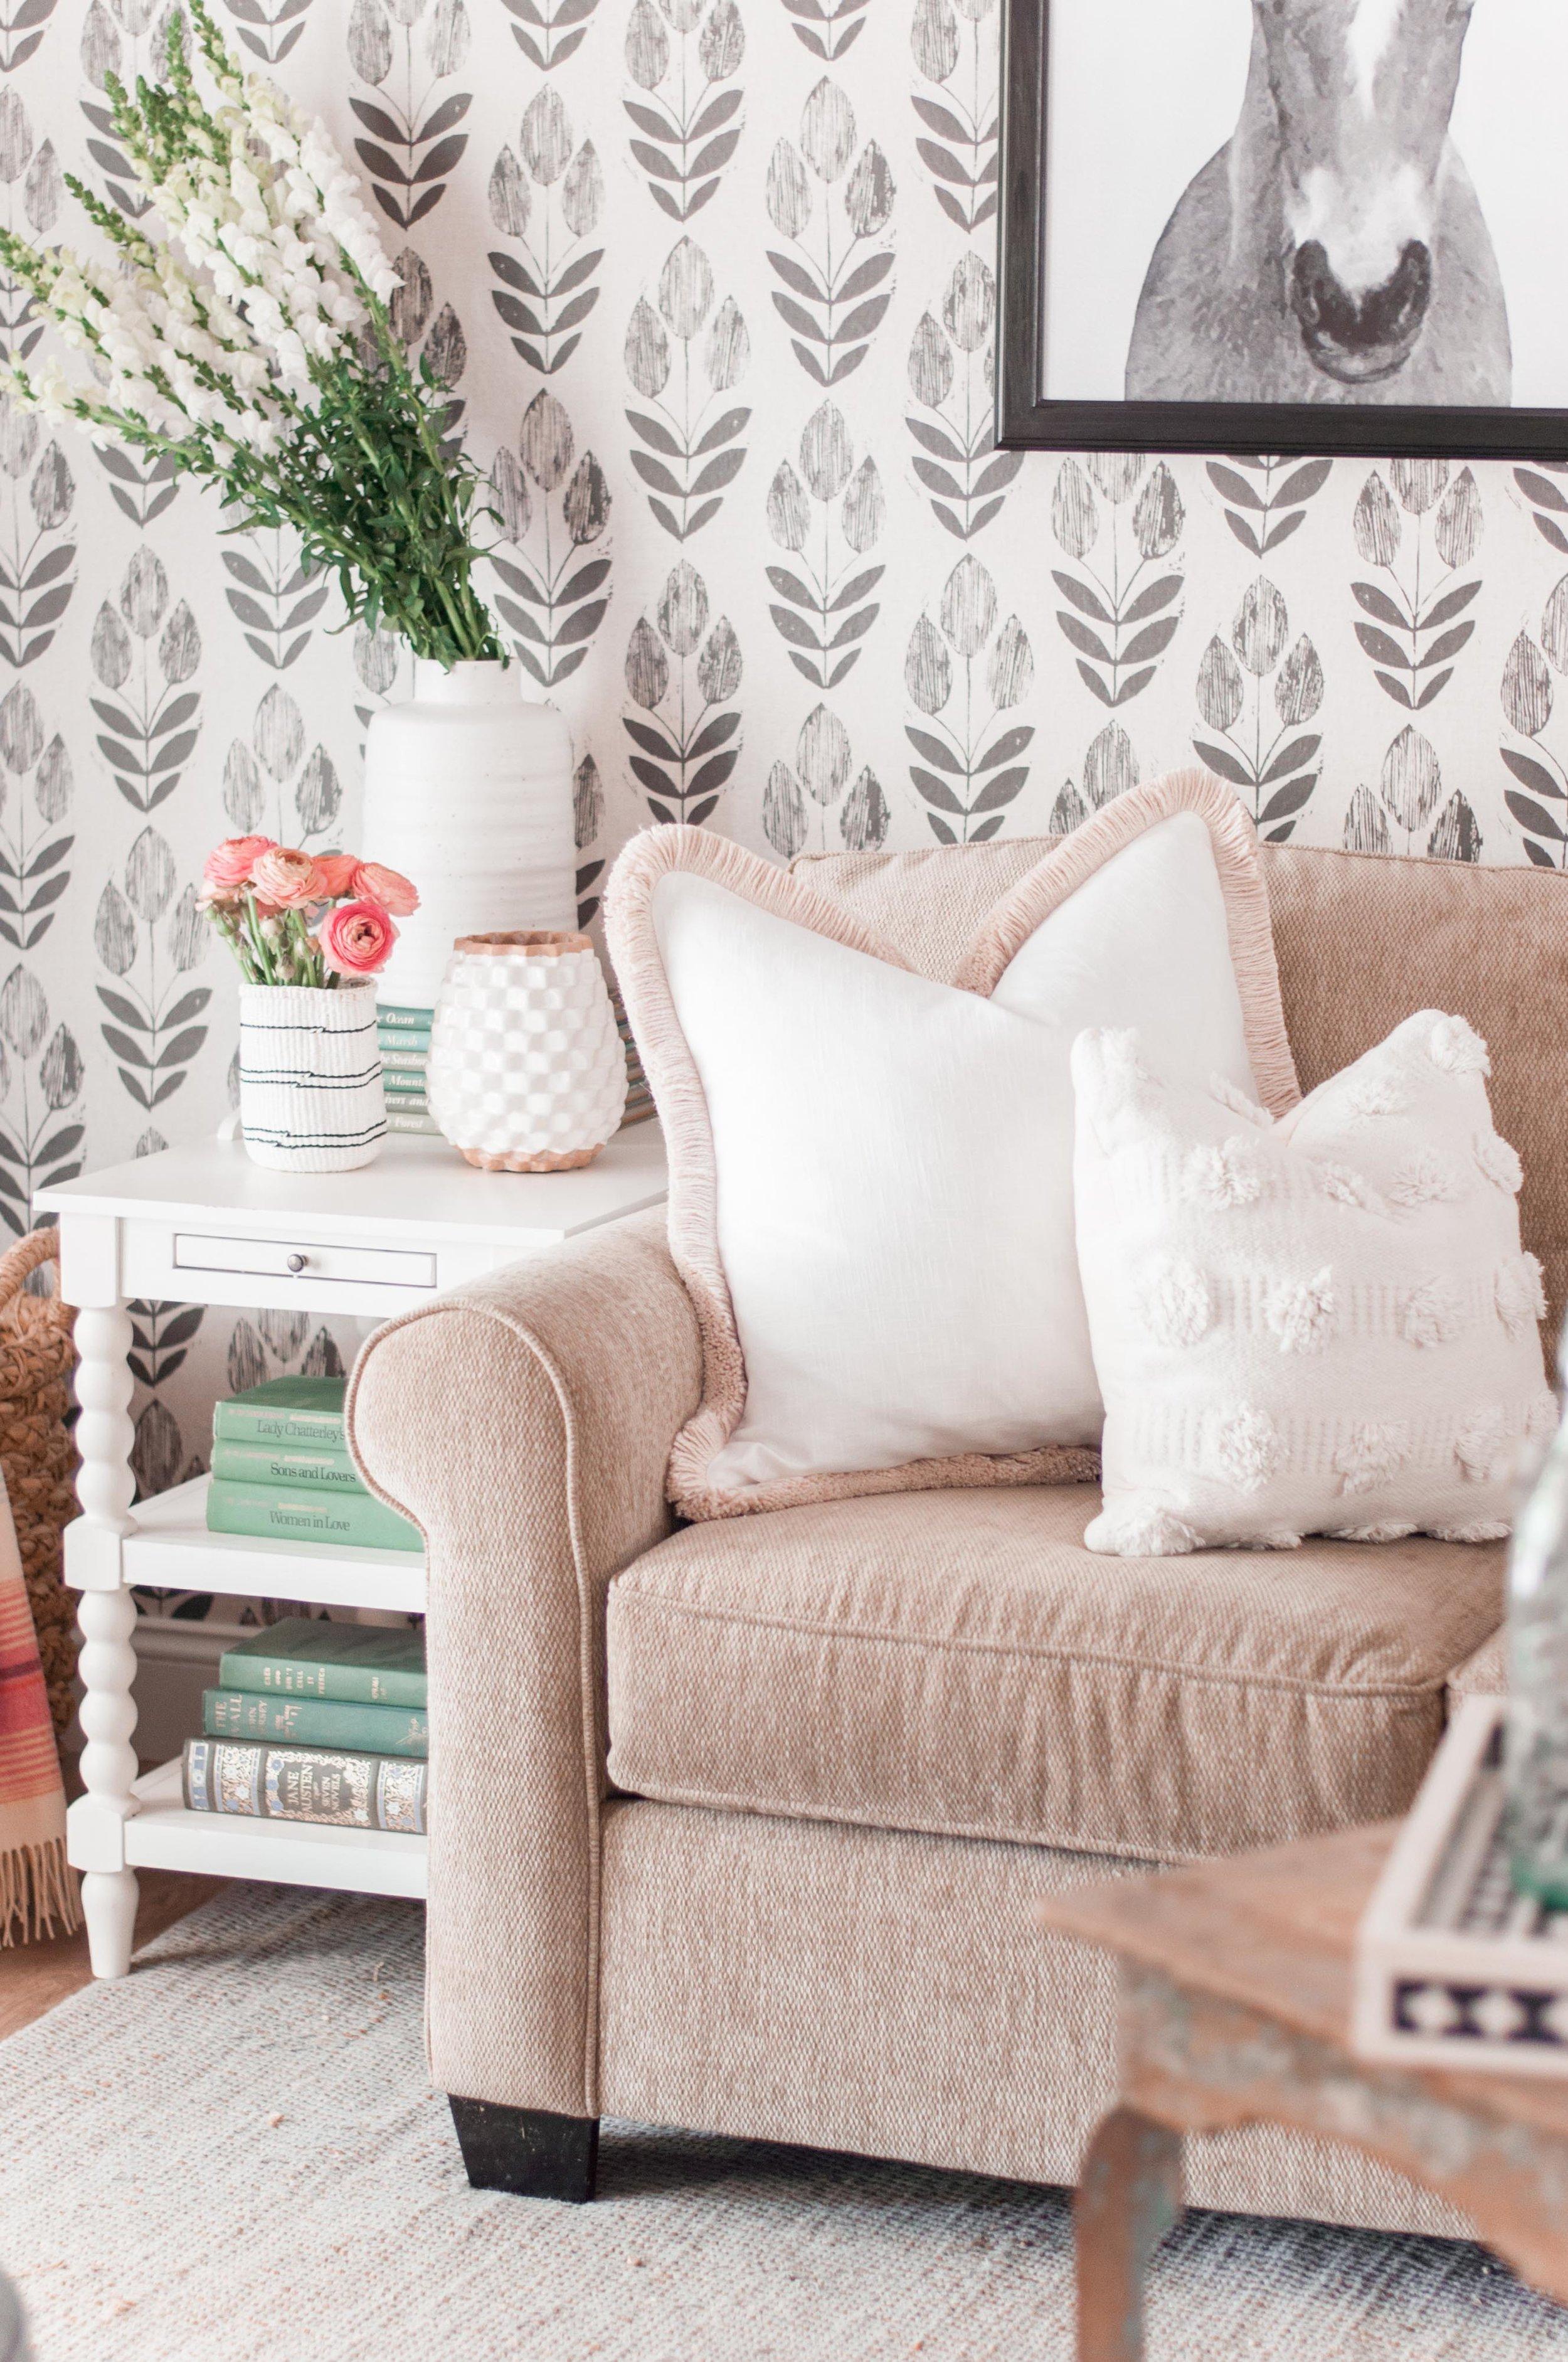 DIY Living Room Decor